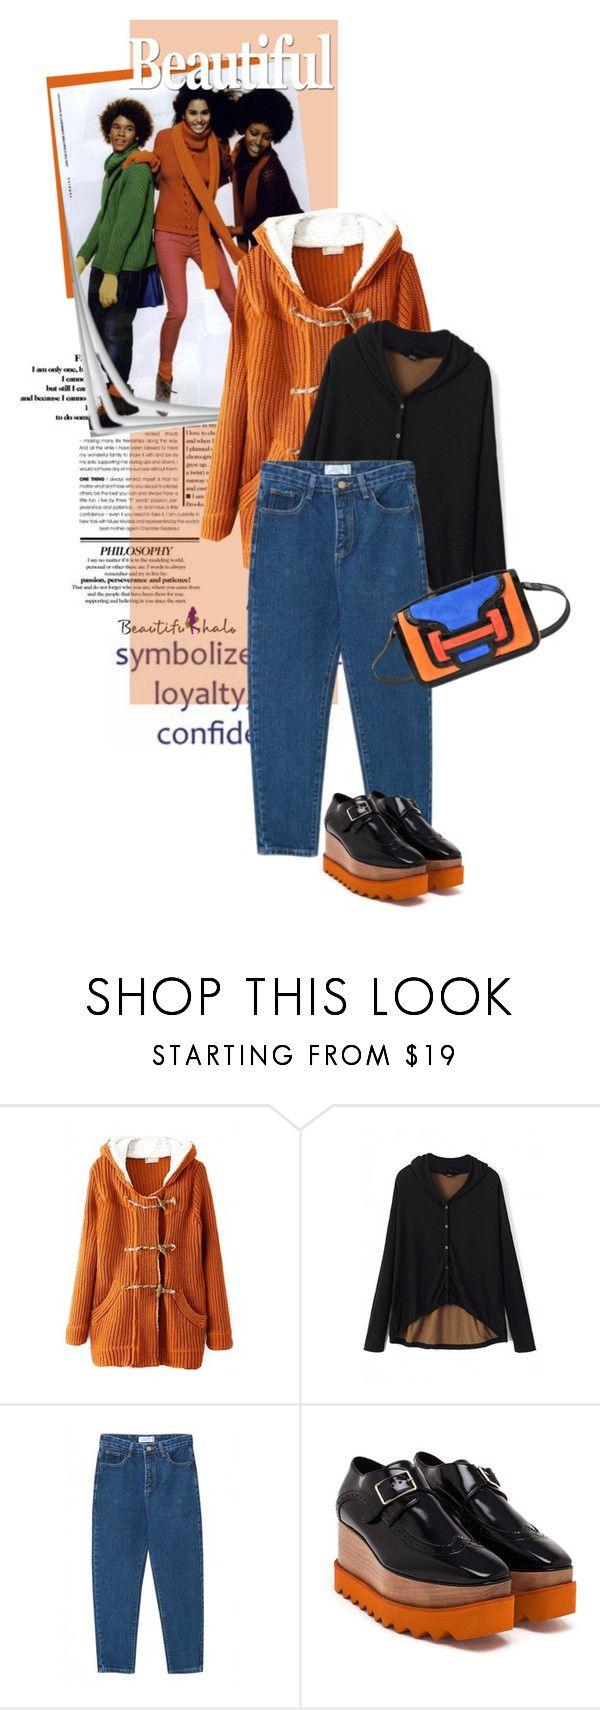 """beautifulhalo.com 6"" by meyli-meyli ❤ liked on Polyvore featuring Benetton, STELLA McCARTNEY, Pierre Hardy, women's clothing, women, female, woman, misses, juniors and beautifulhalo"